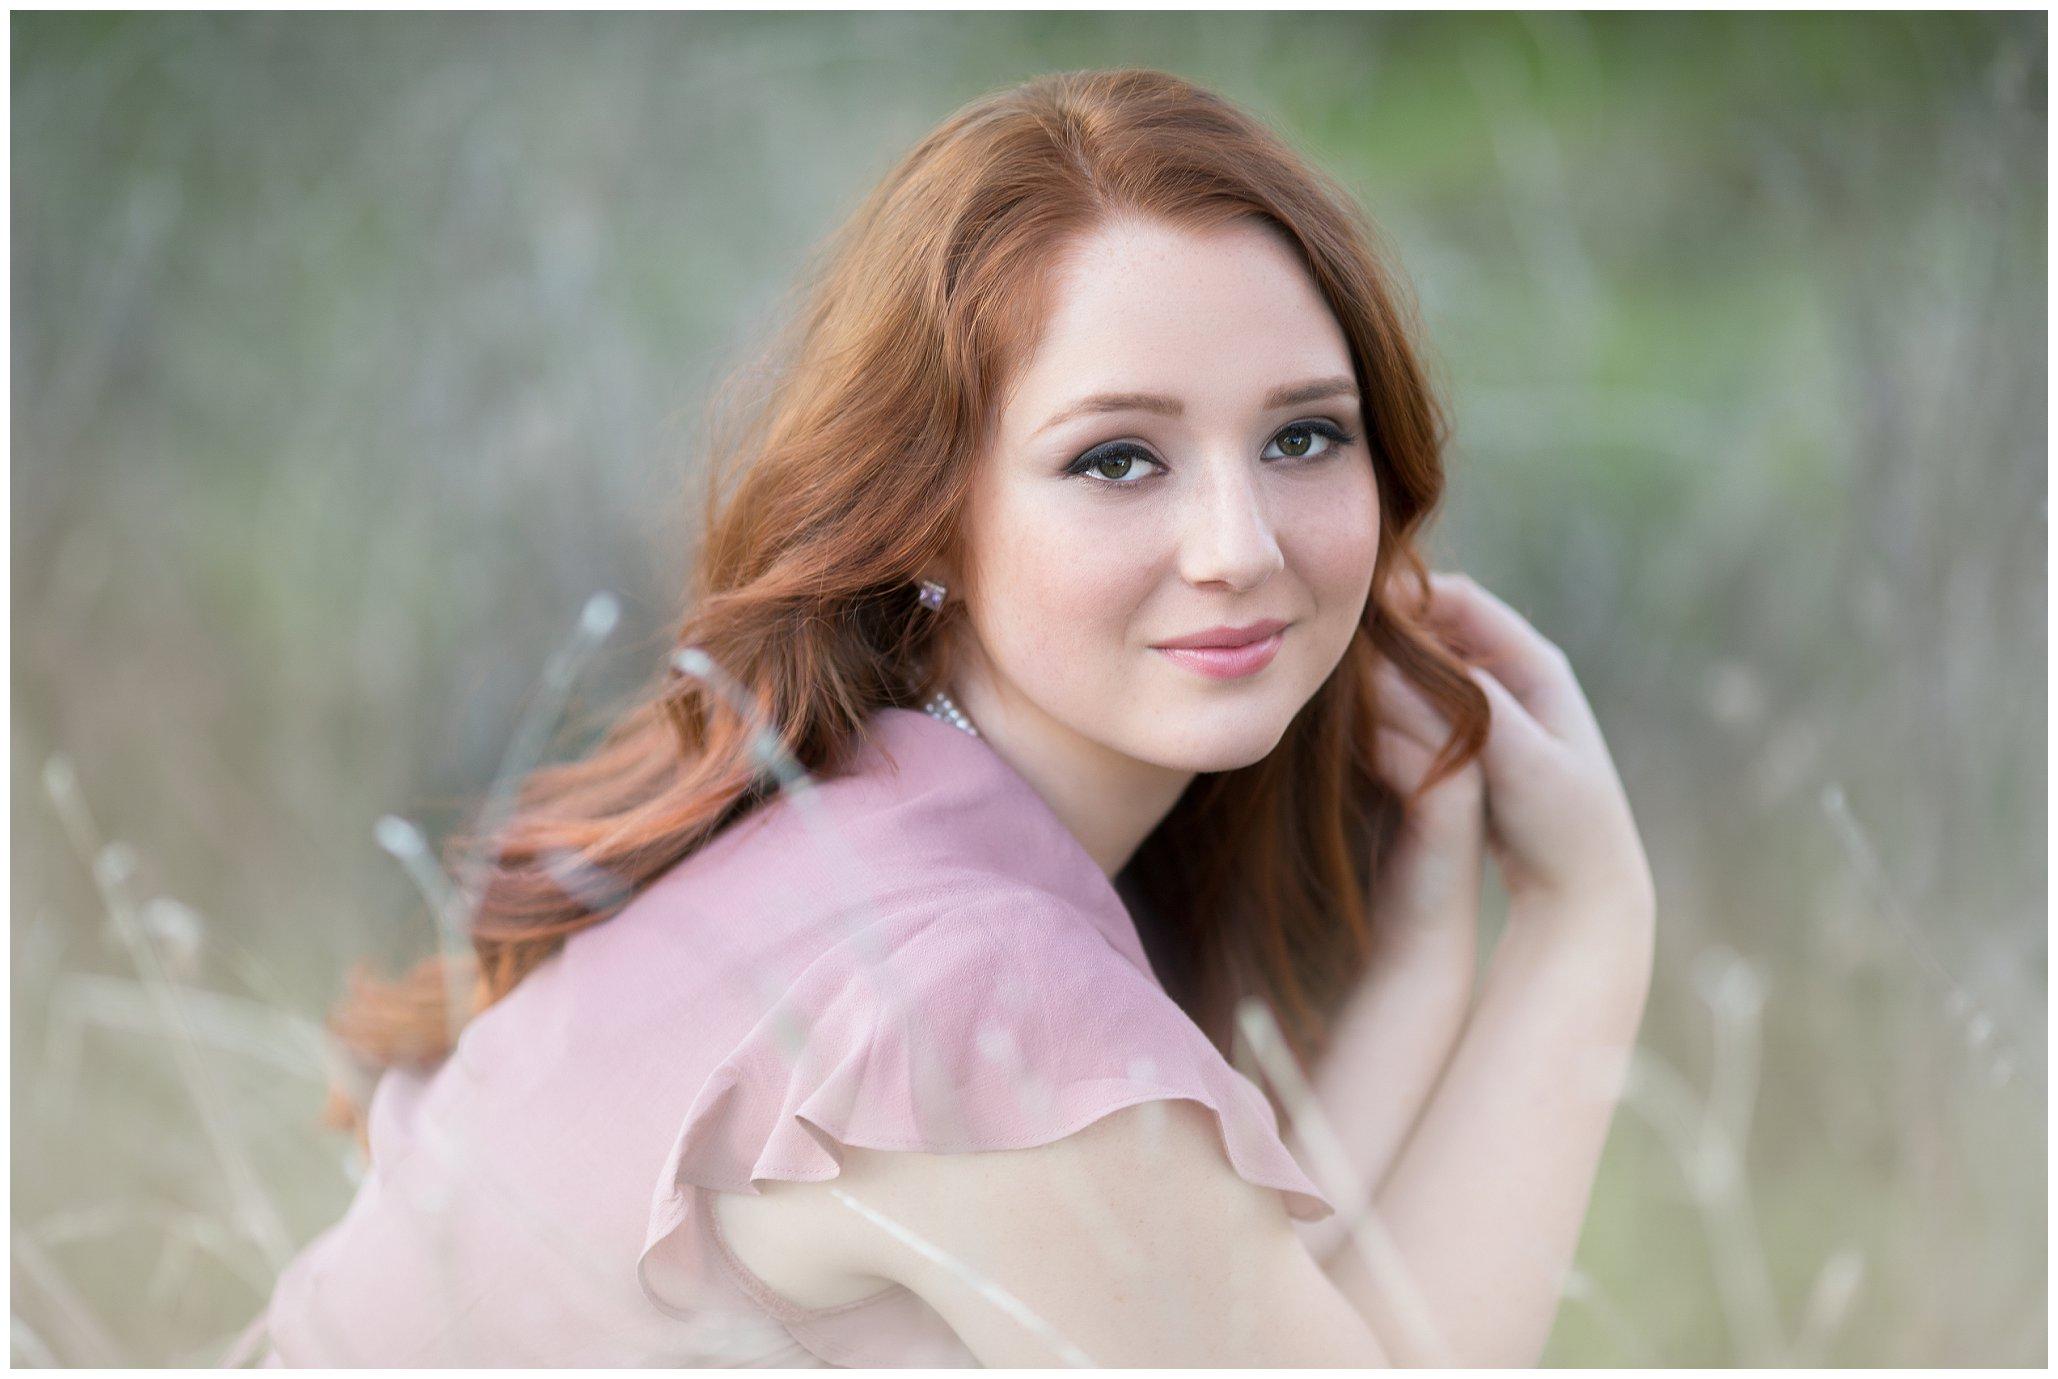 redhead-senior-portraits-del-campo-high-school_0256.jpg